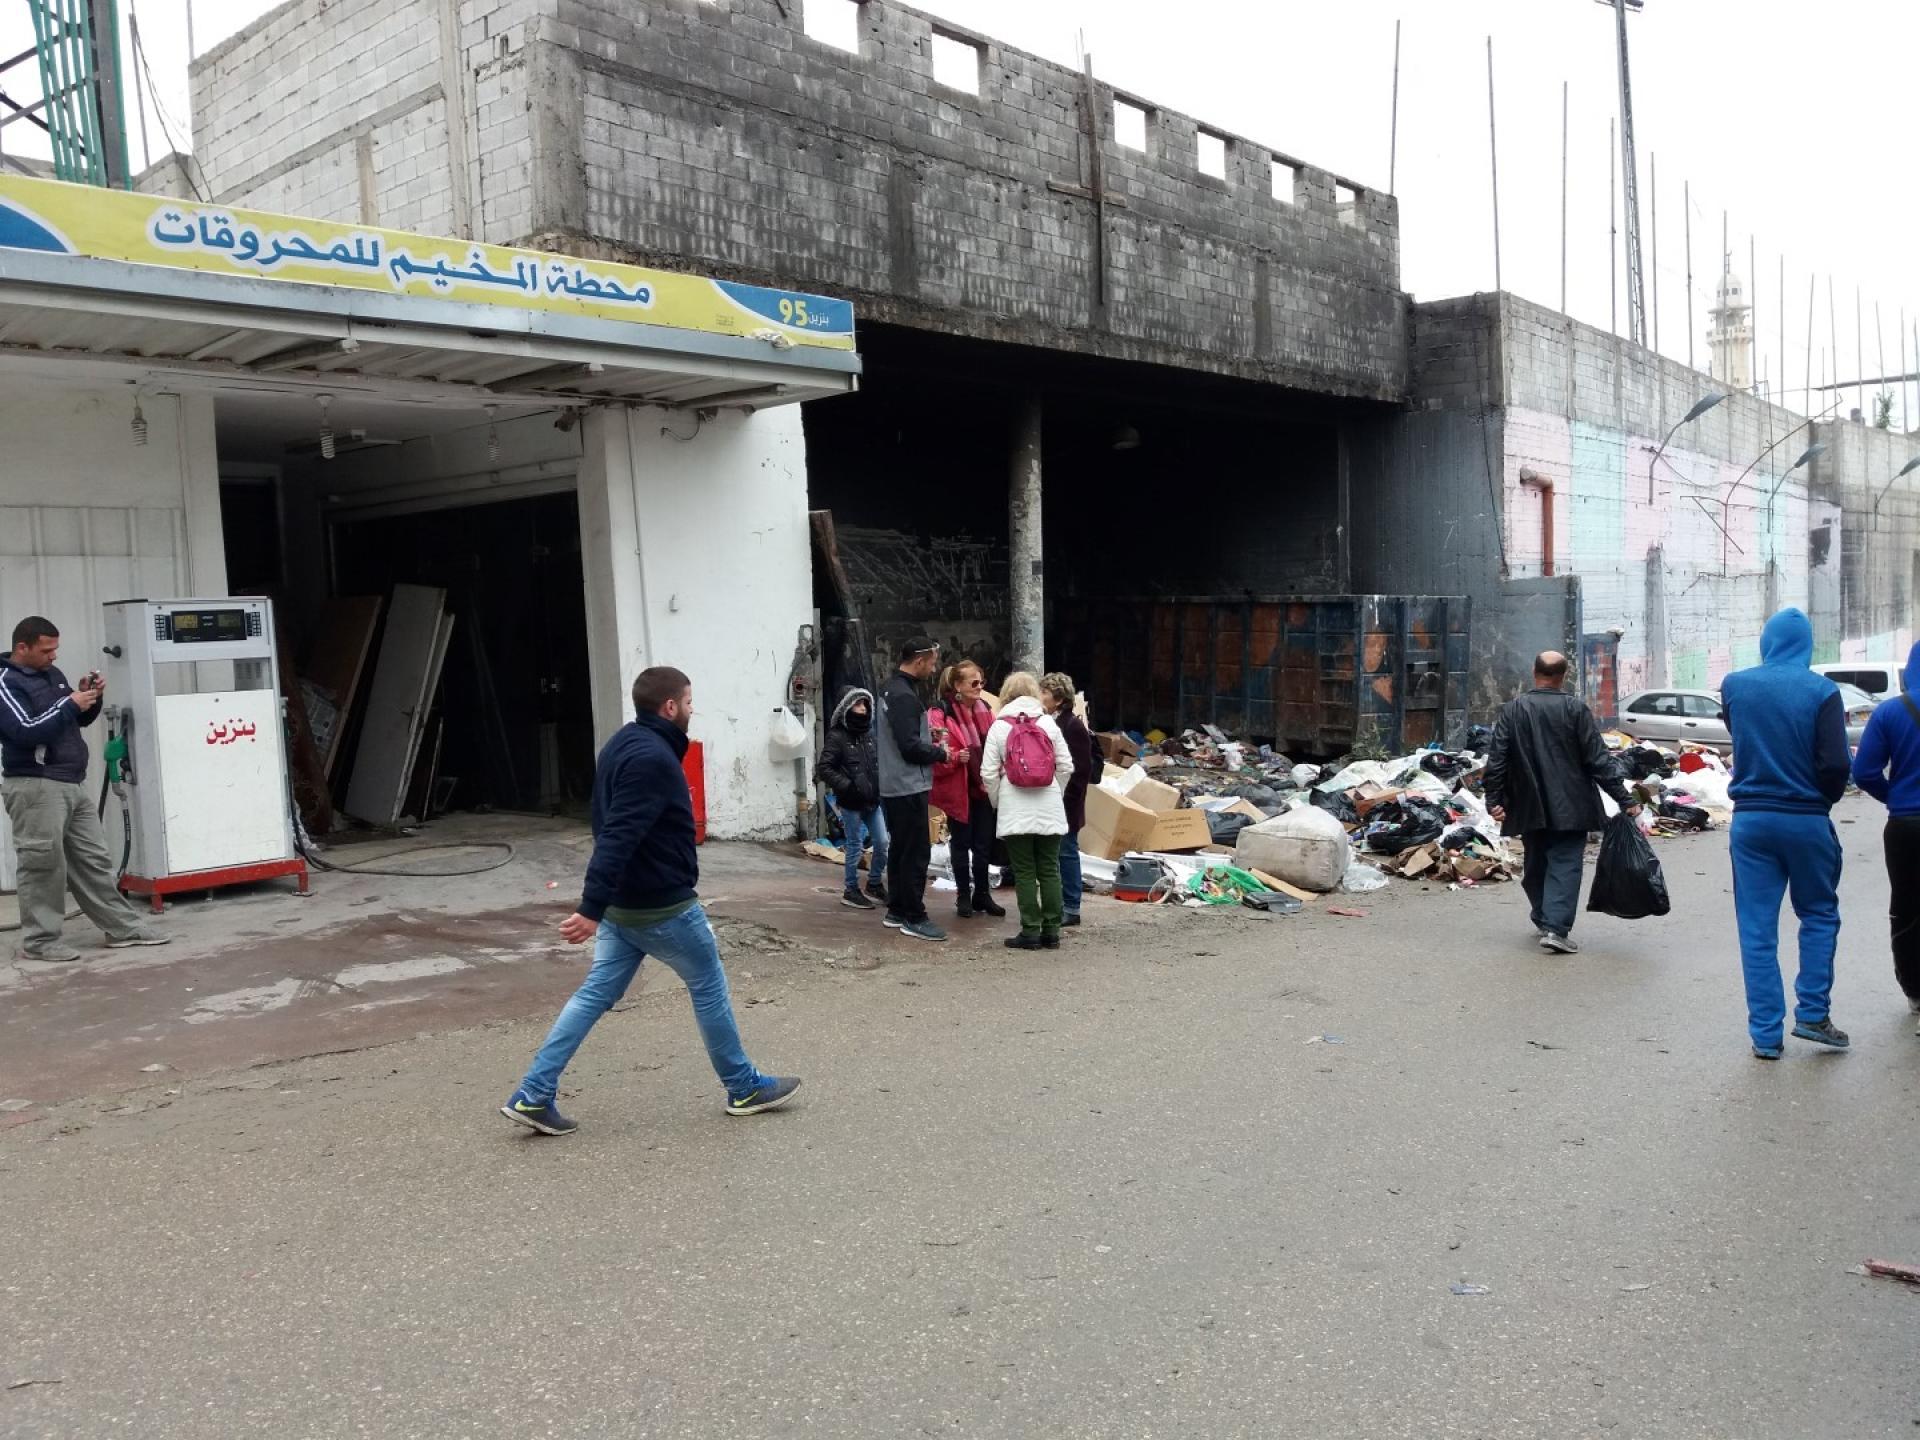 Near the garbage dump